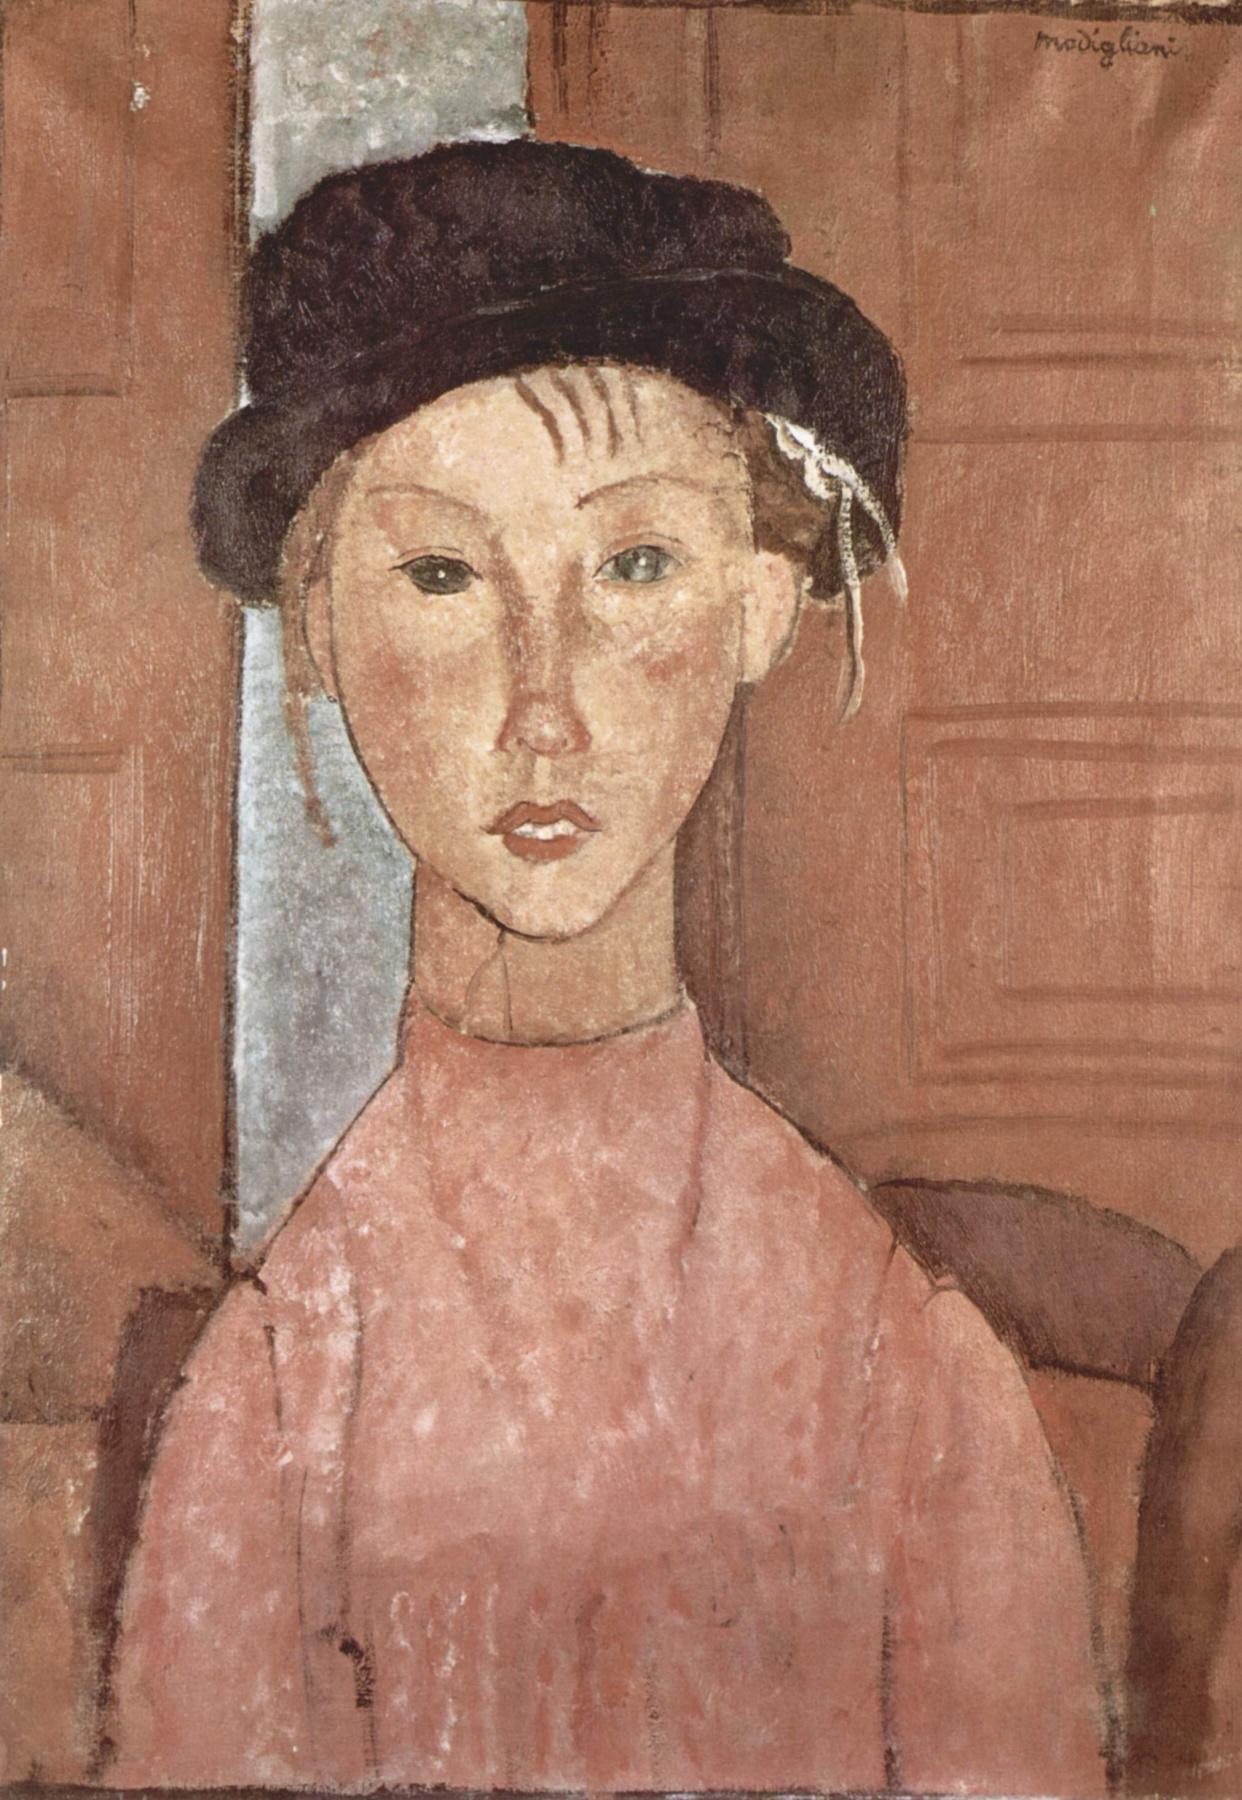 Amedeo Modigliani. The girl in the hat